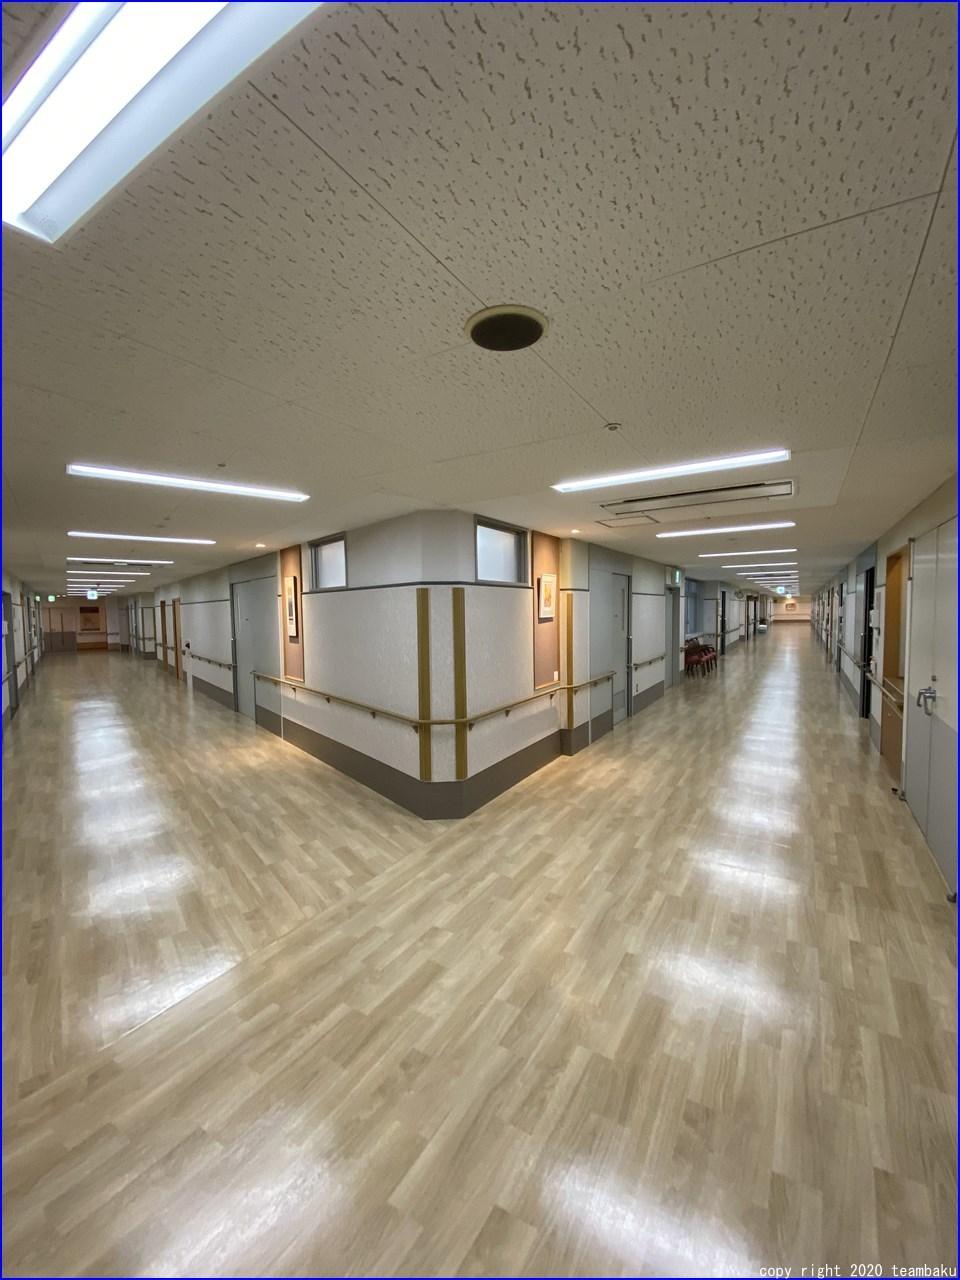 N病院グループ N病院東館 介護医療院 転換改修工事 4_c0376508_10425760.jpg